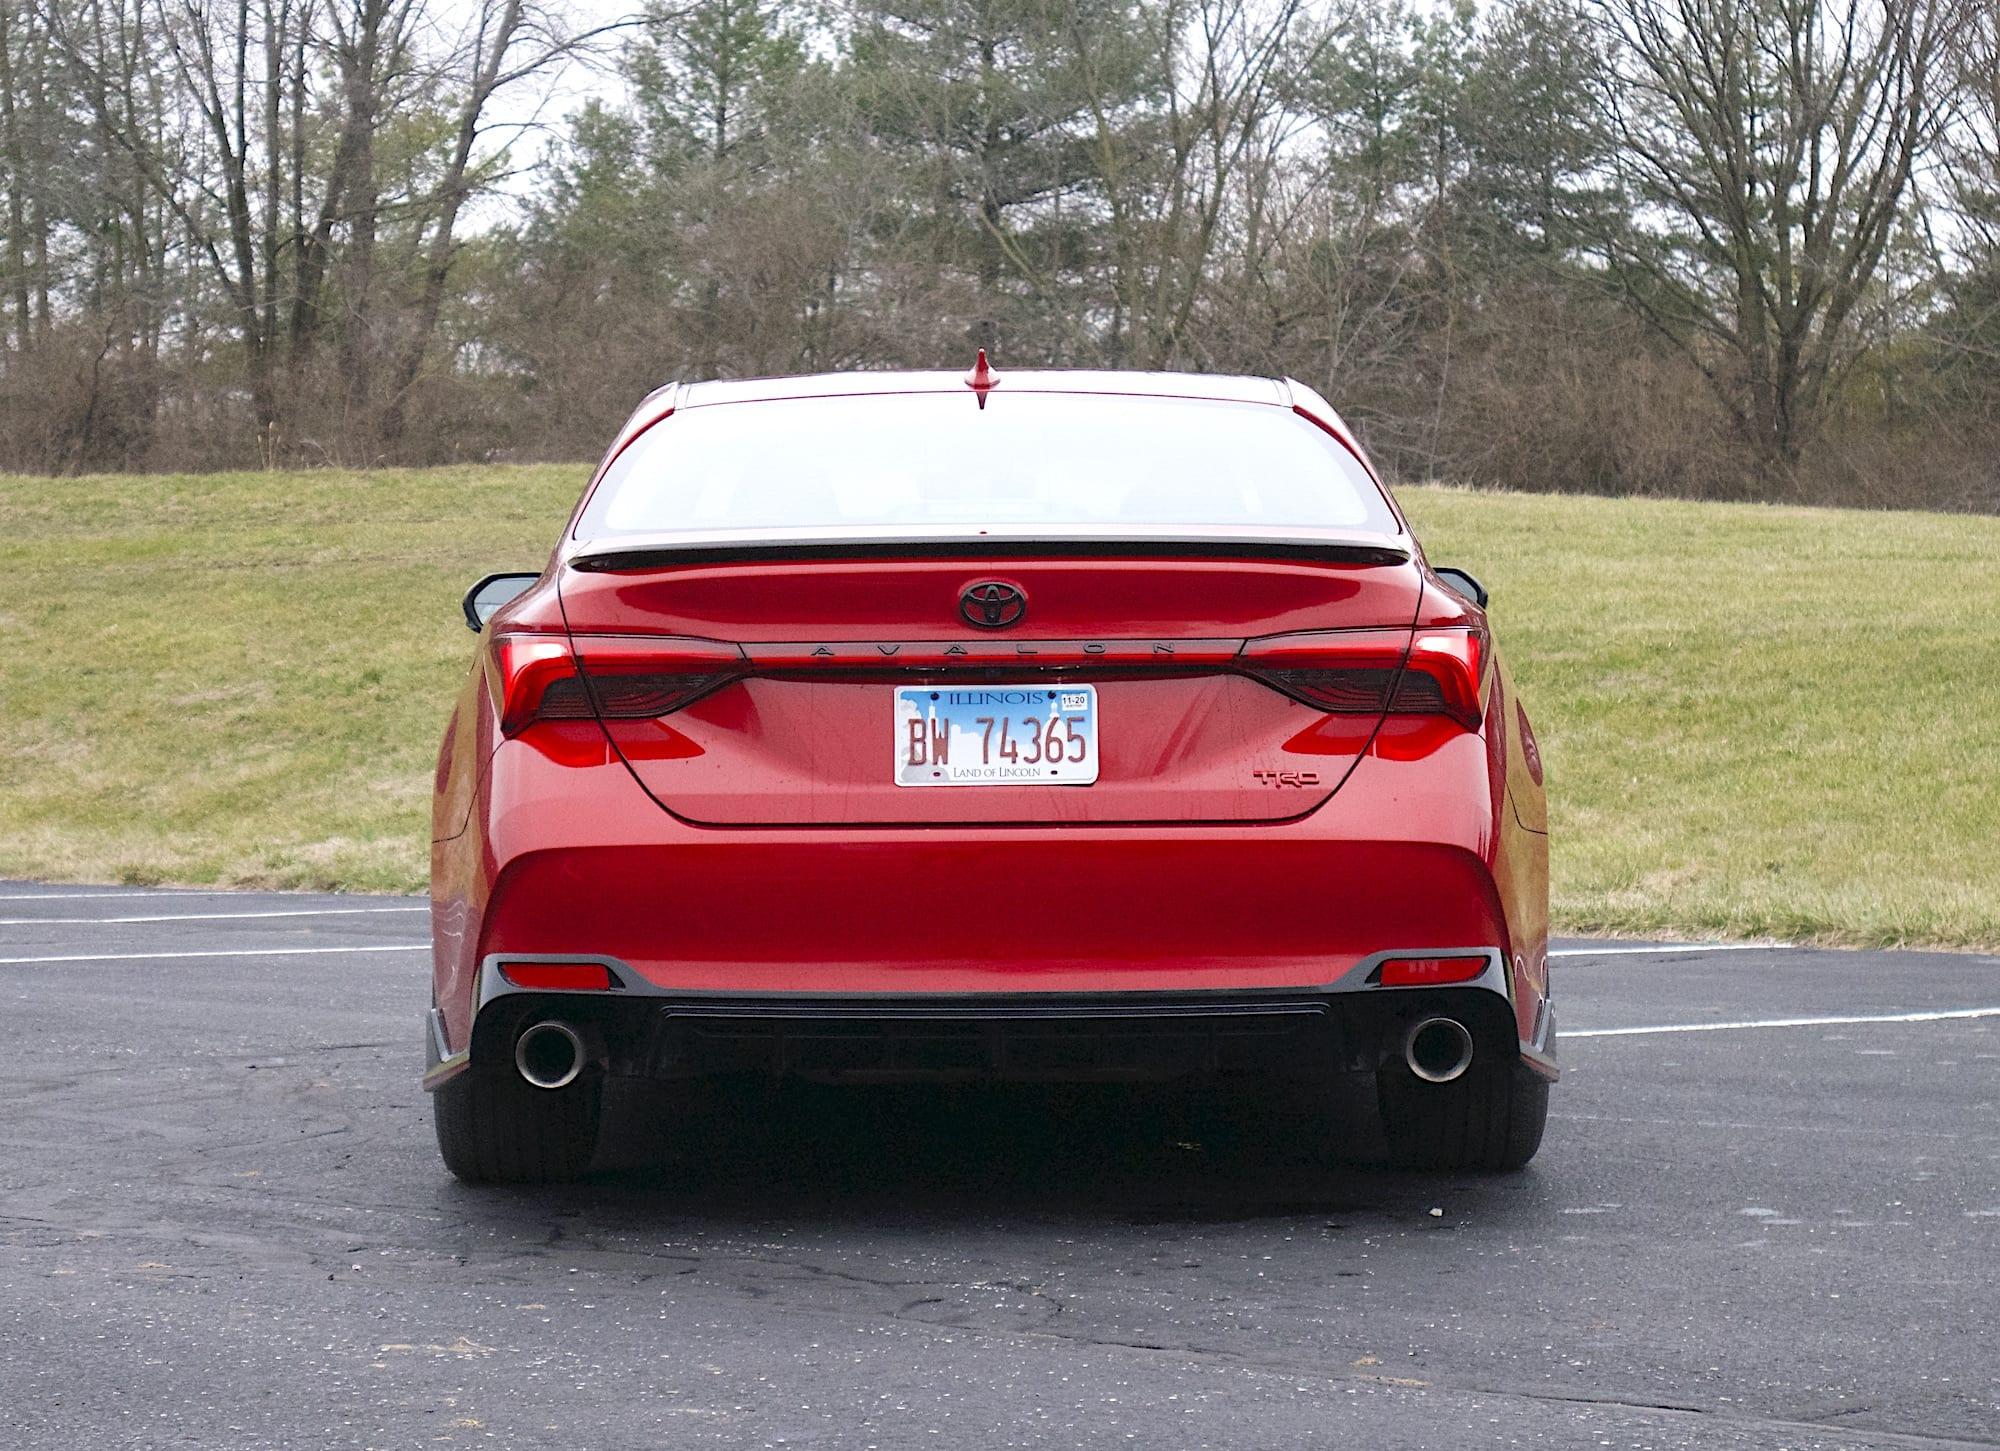 2020 toyota Avalon TRD rear